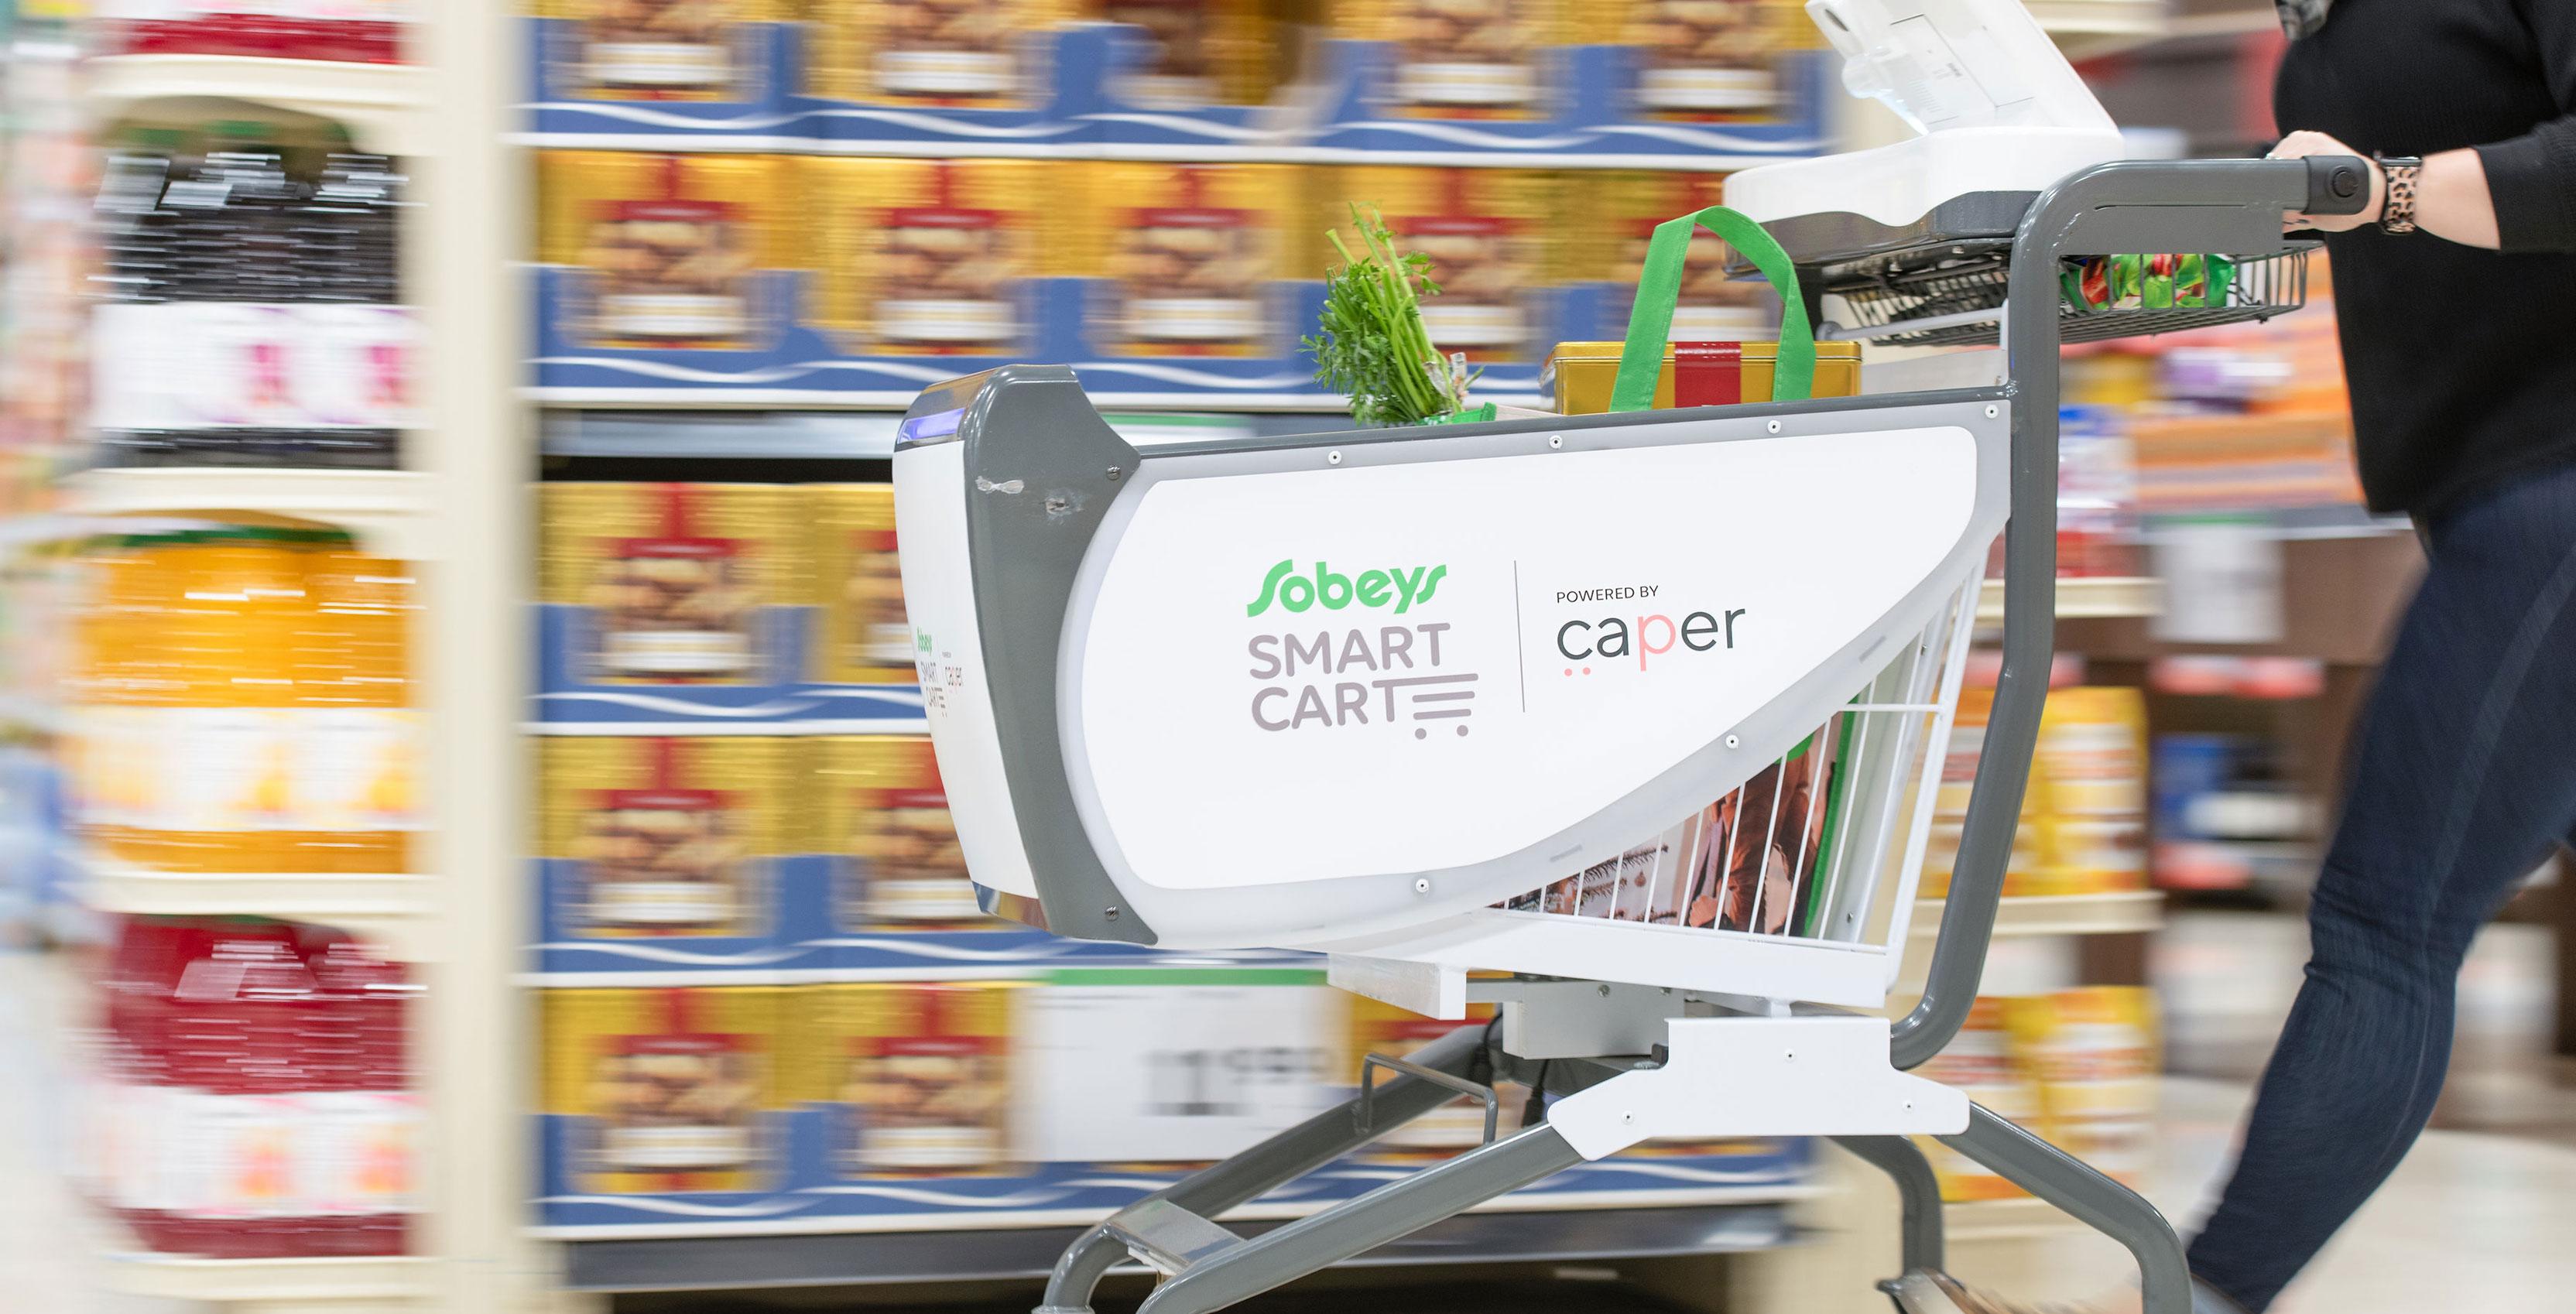 Sobeys Smart Cart